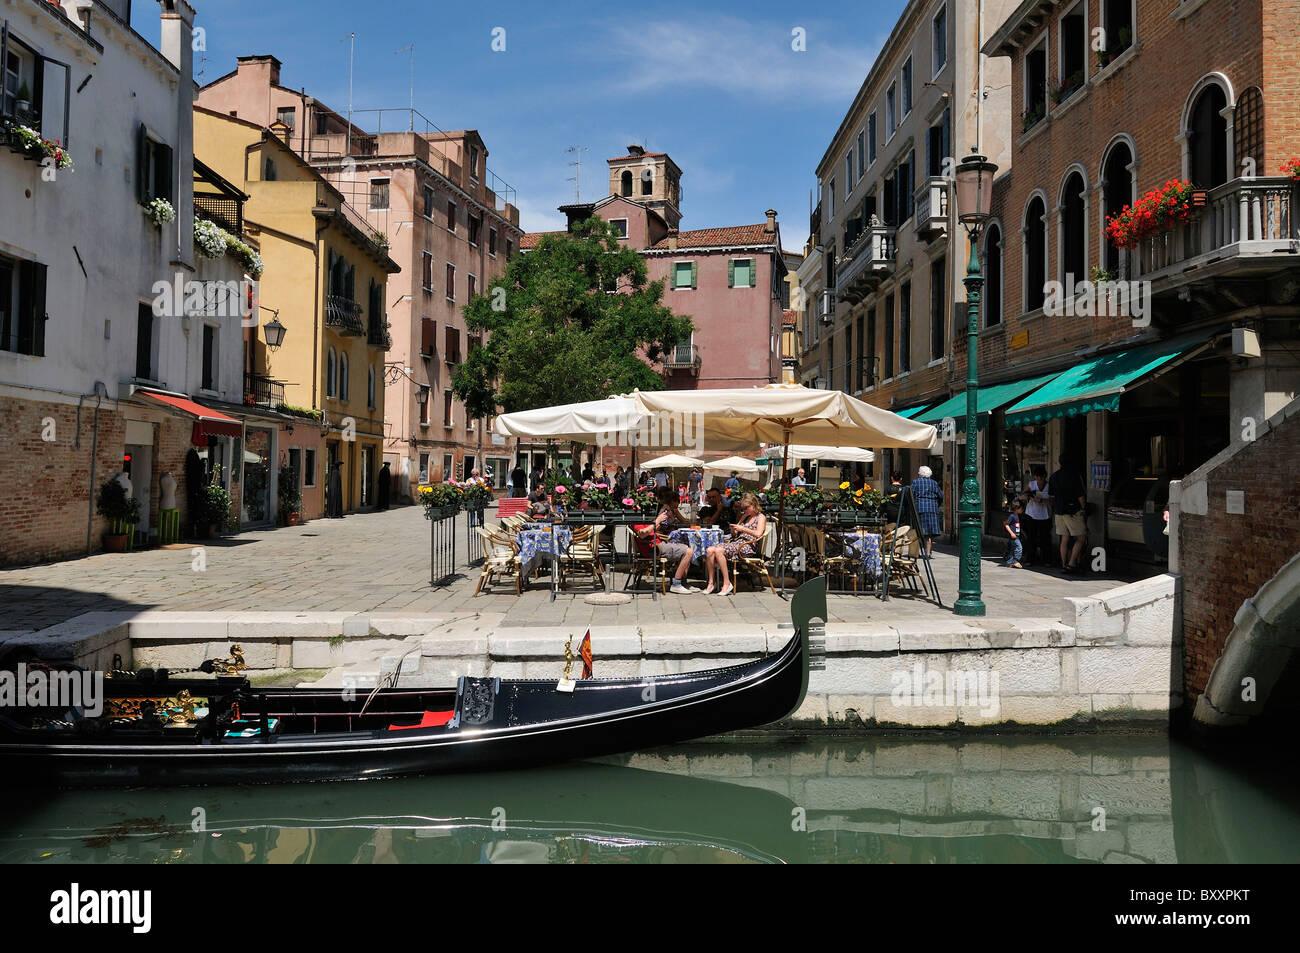 Venice. Italy. Fondamenta del Piovan & Campo Santa Maria Nova, Cannaregio. - Stock Image